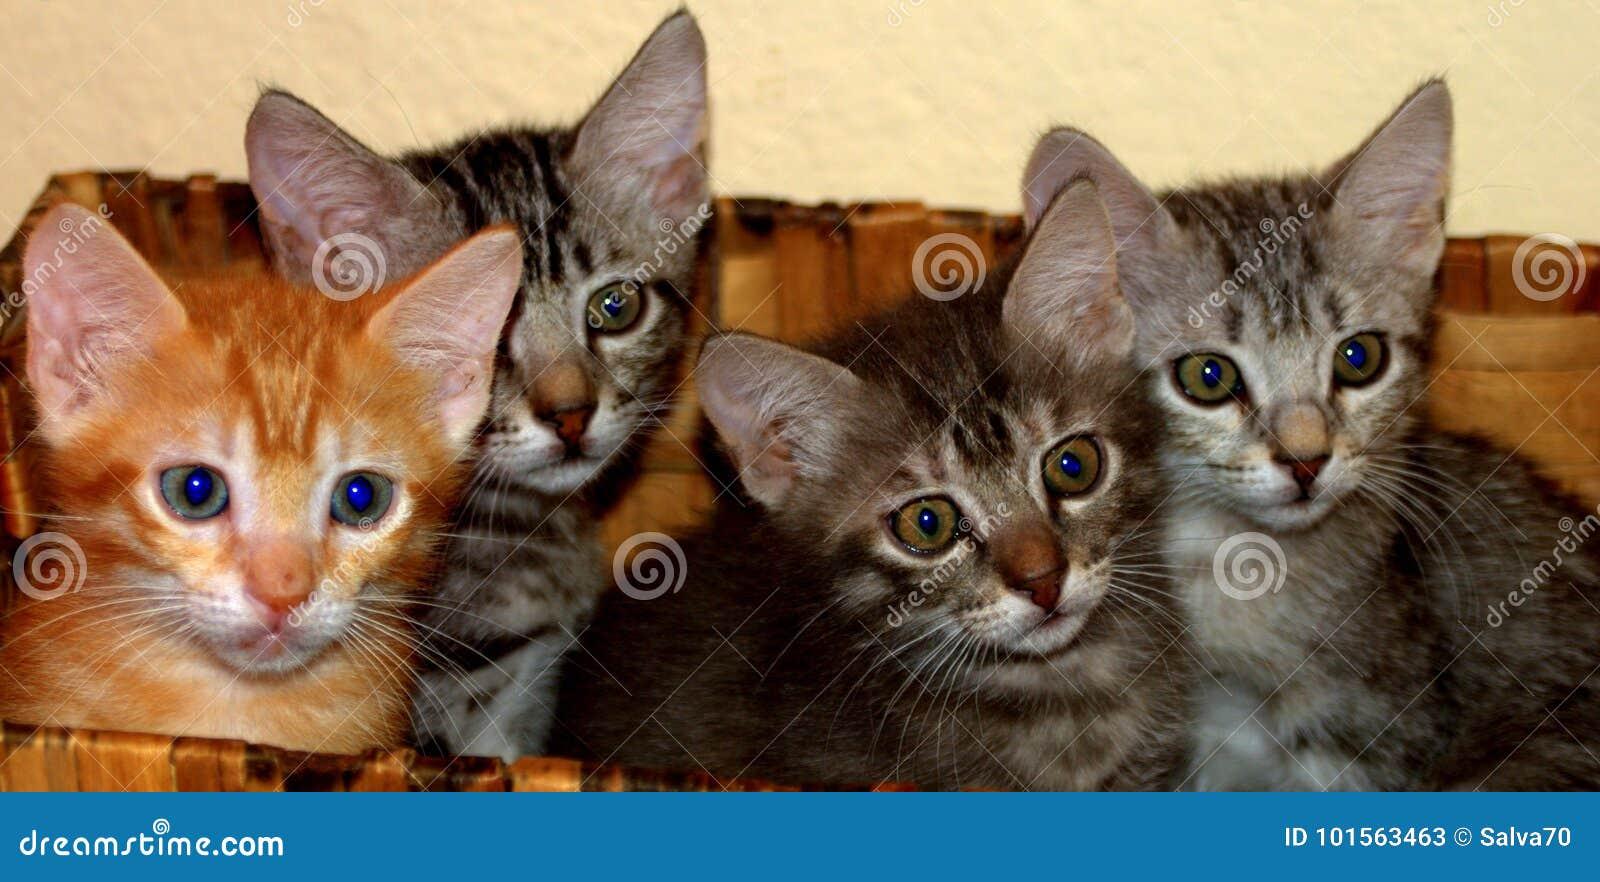 Felines